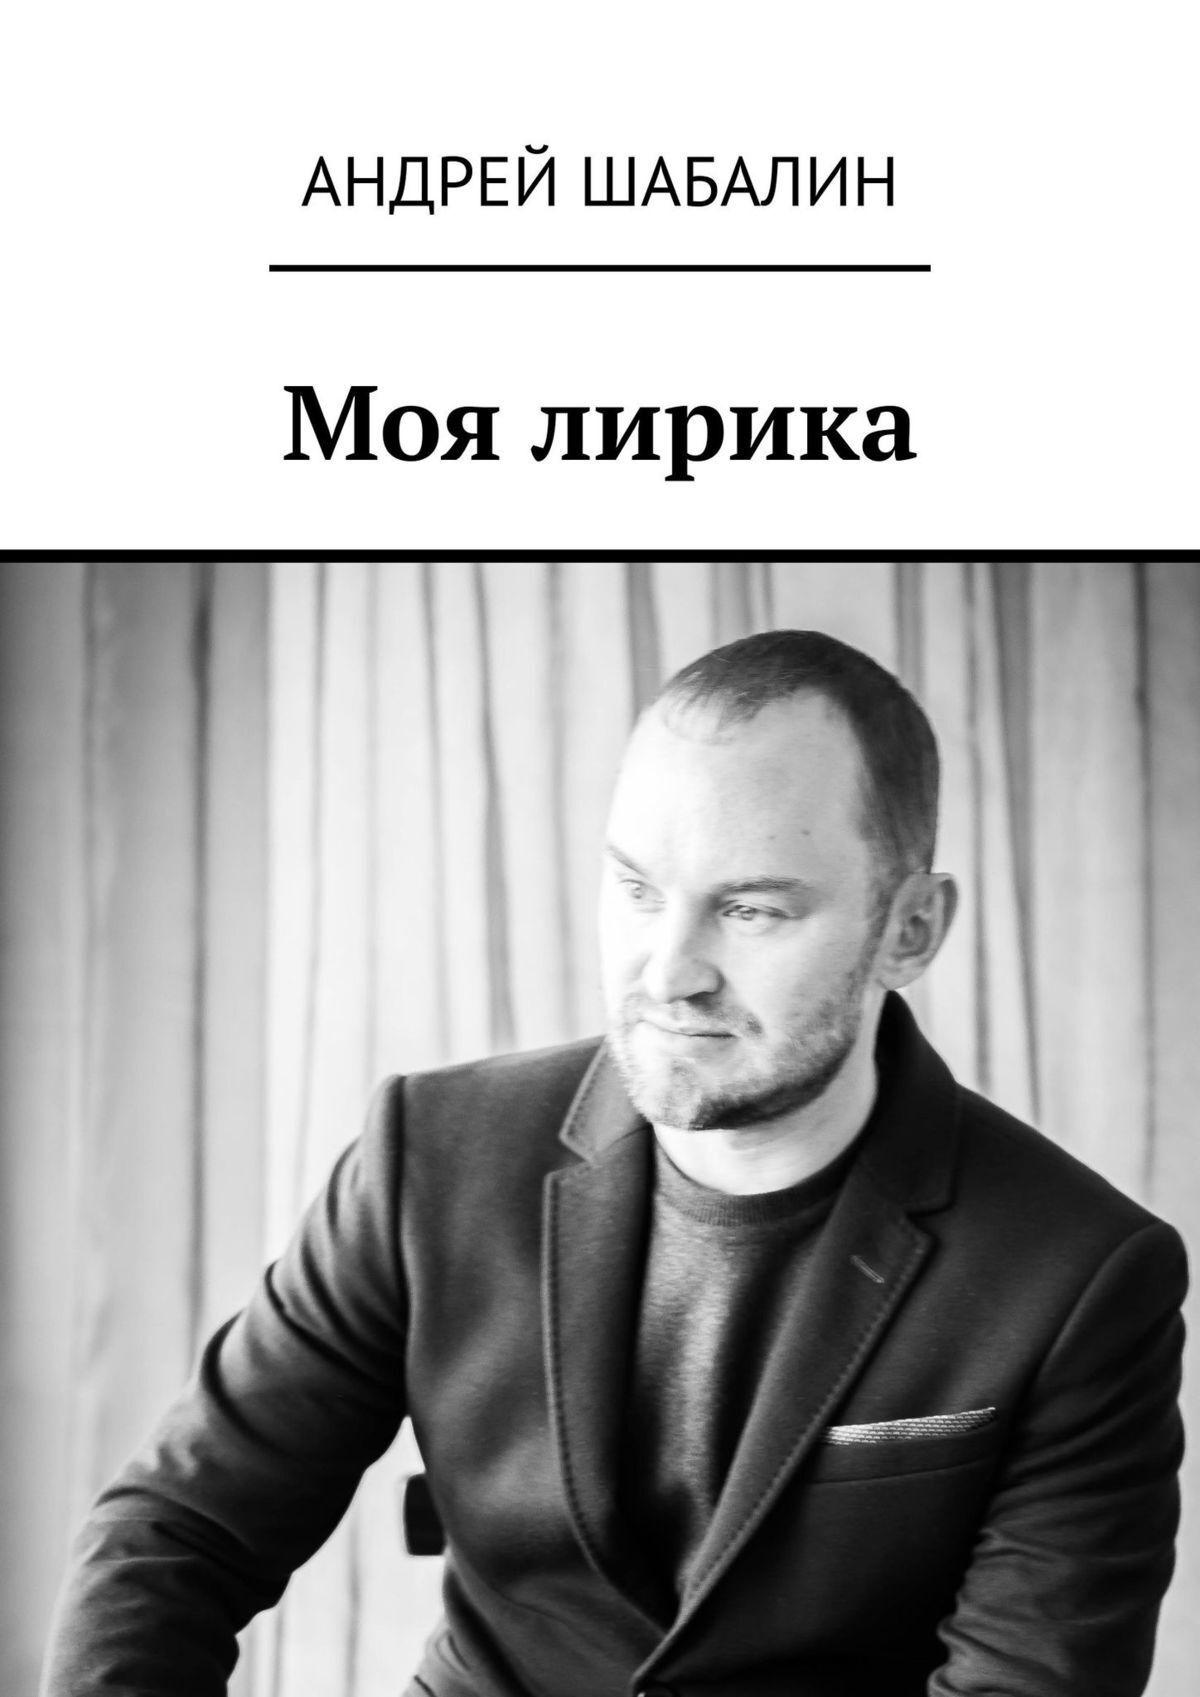 Андрей Шабалин Моя лирика